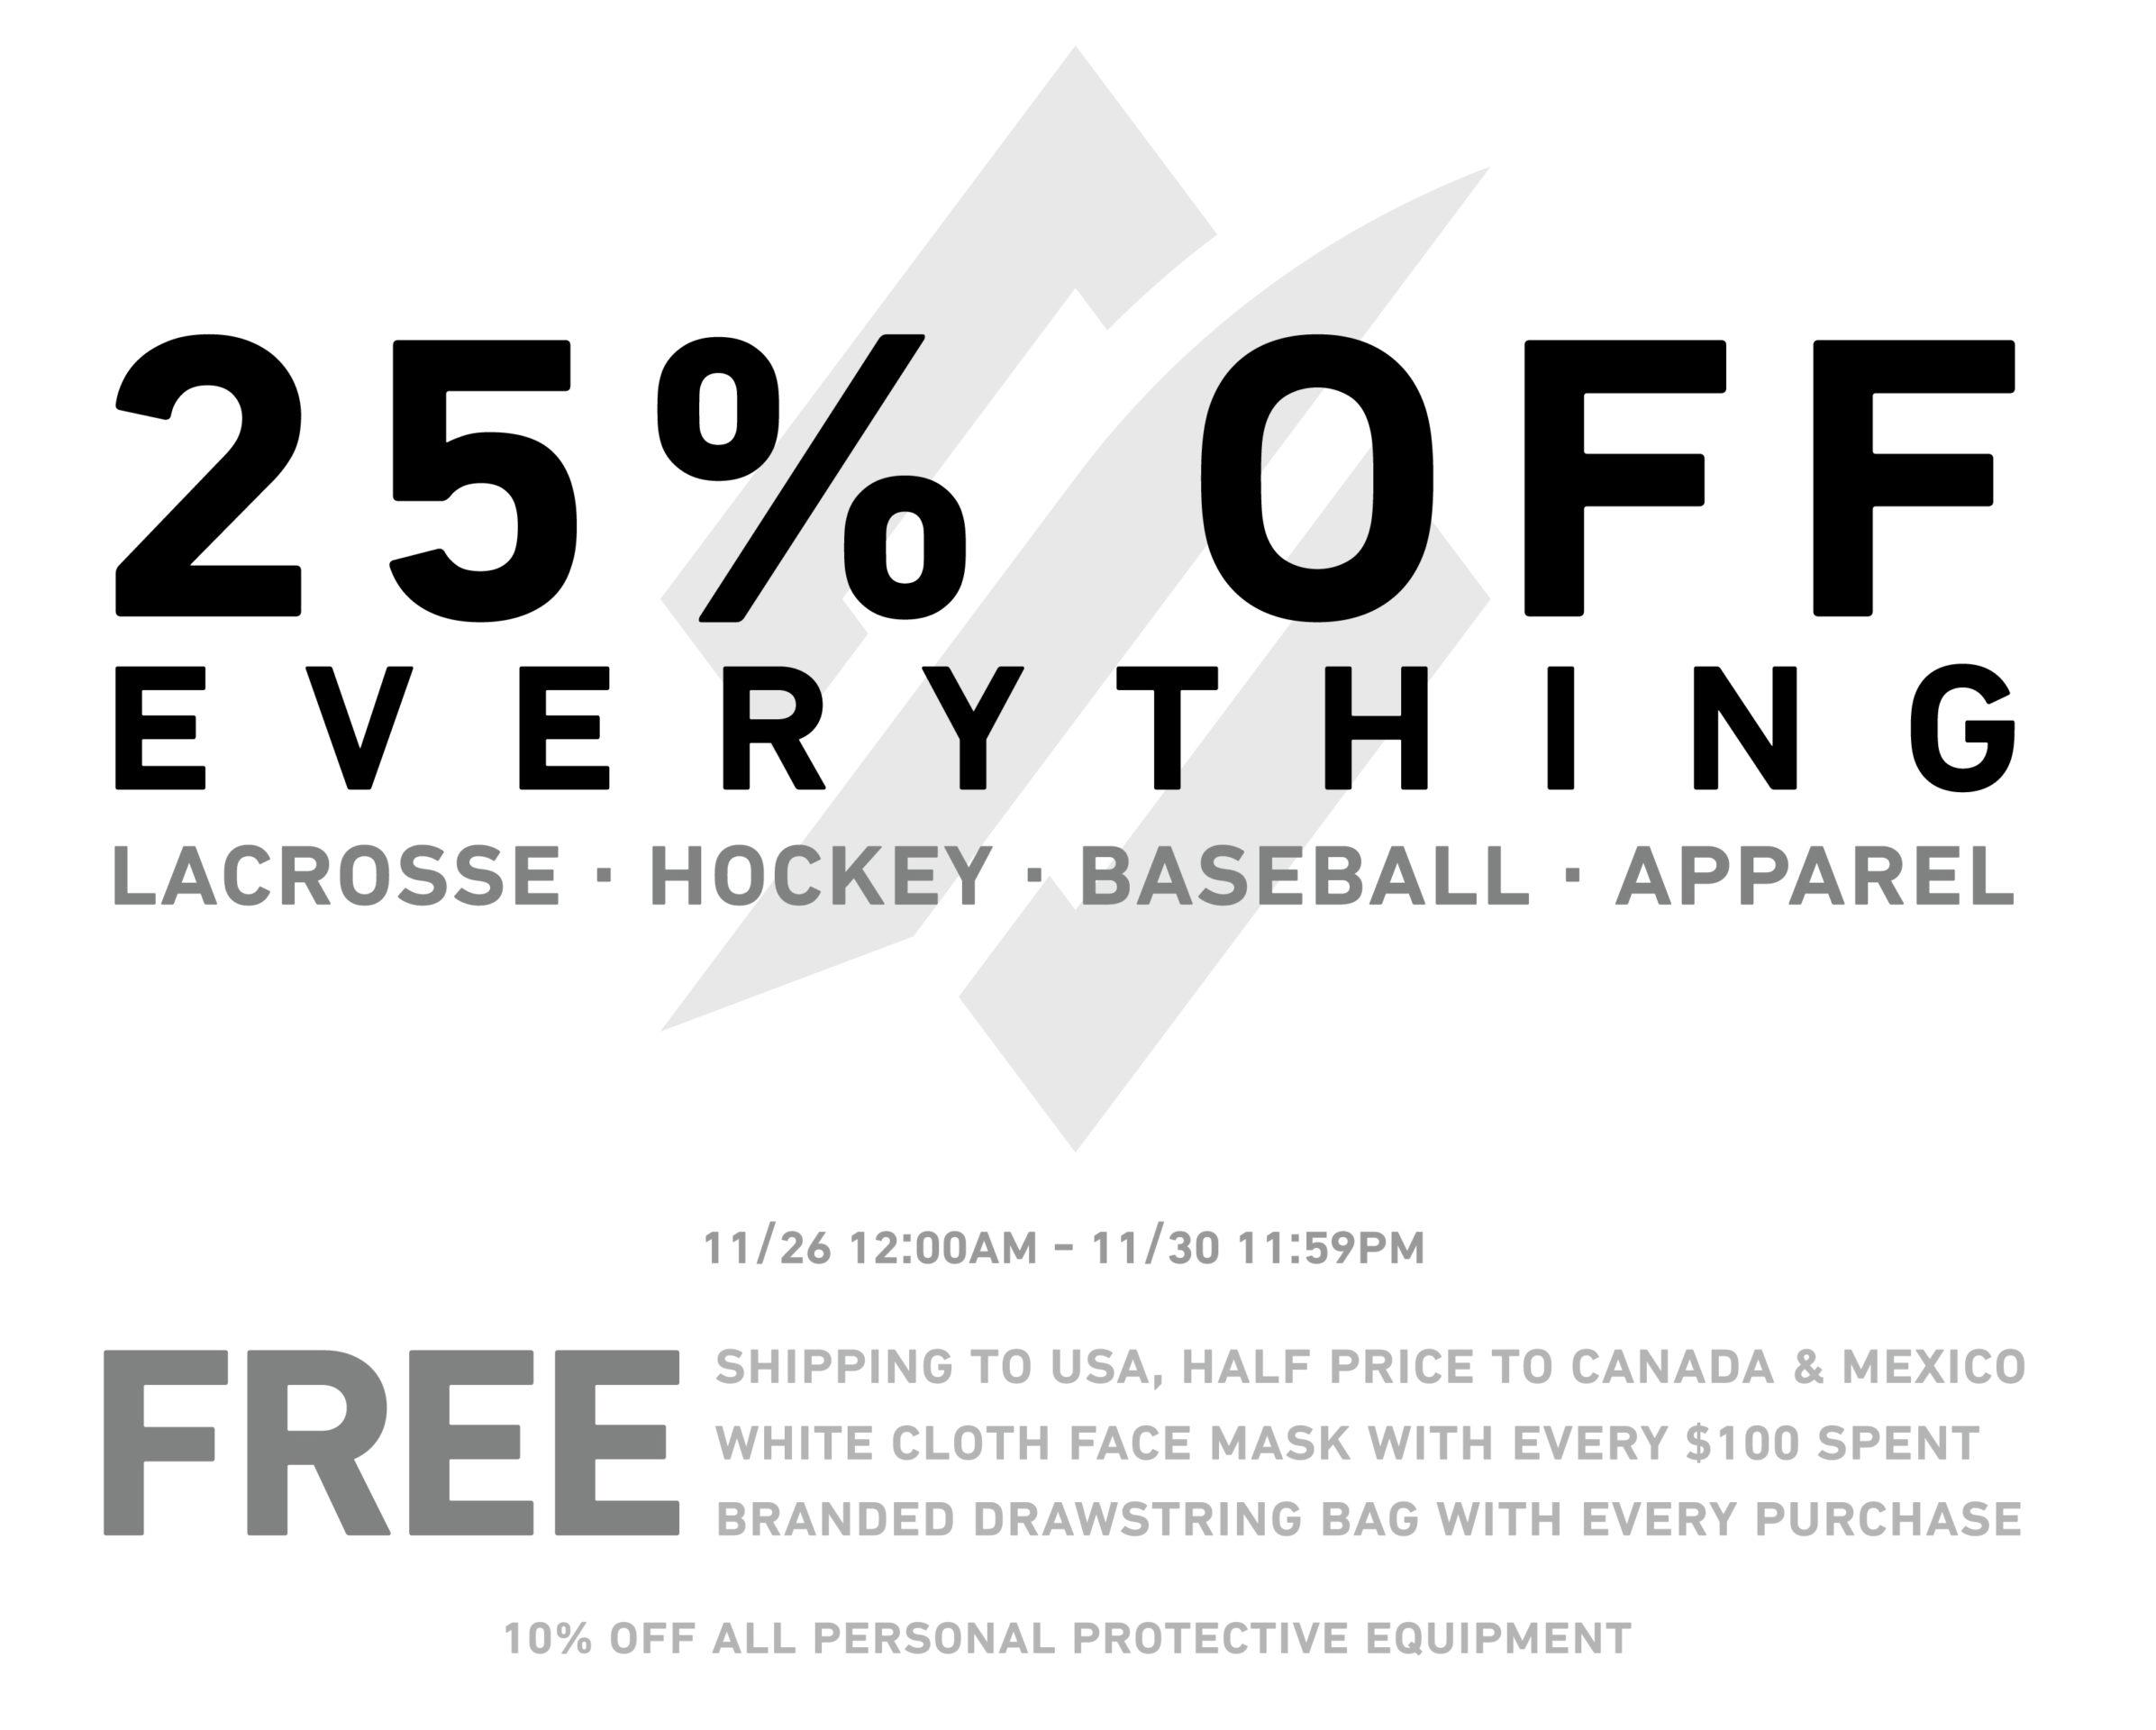 StringKing Black Friday Discounts Deals Freebies Lacrosse Hockey Baseball Apparel Information